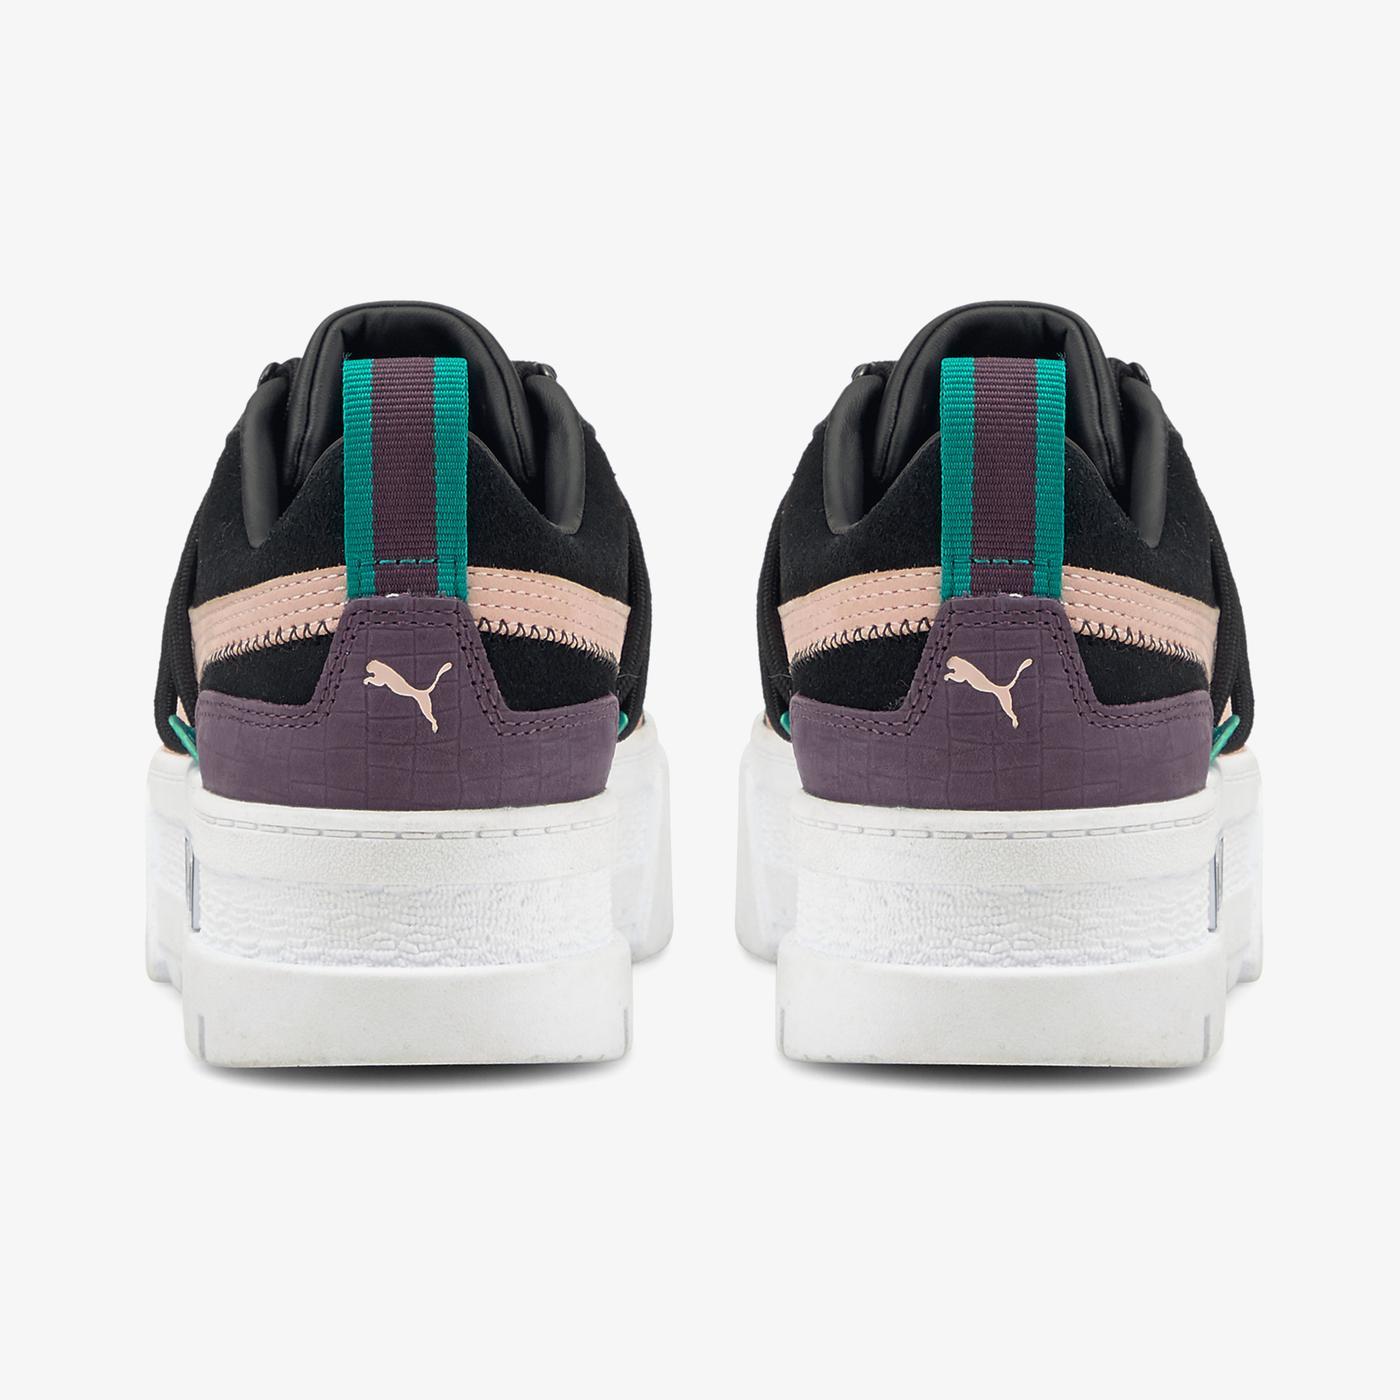 Puma Mayze Kadın Siyah Spor Ayakkabı